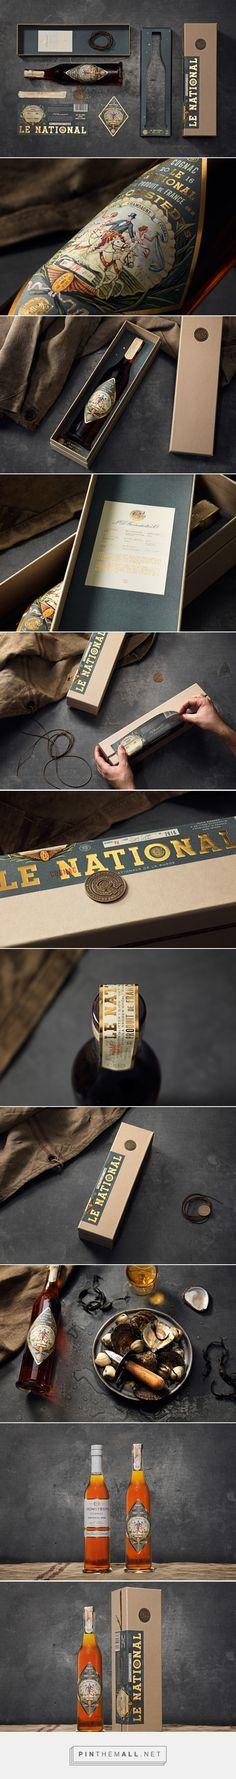 Le National Packaging Design by NINE (Sweden) - http://www.packagingoftheworld.com/2016/06/le-national-gronstedts-cognac-limited.html